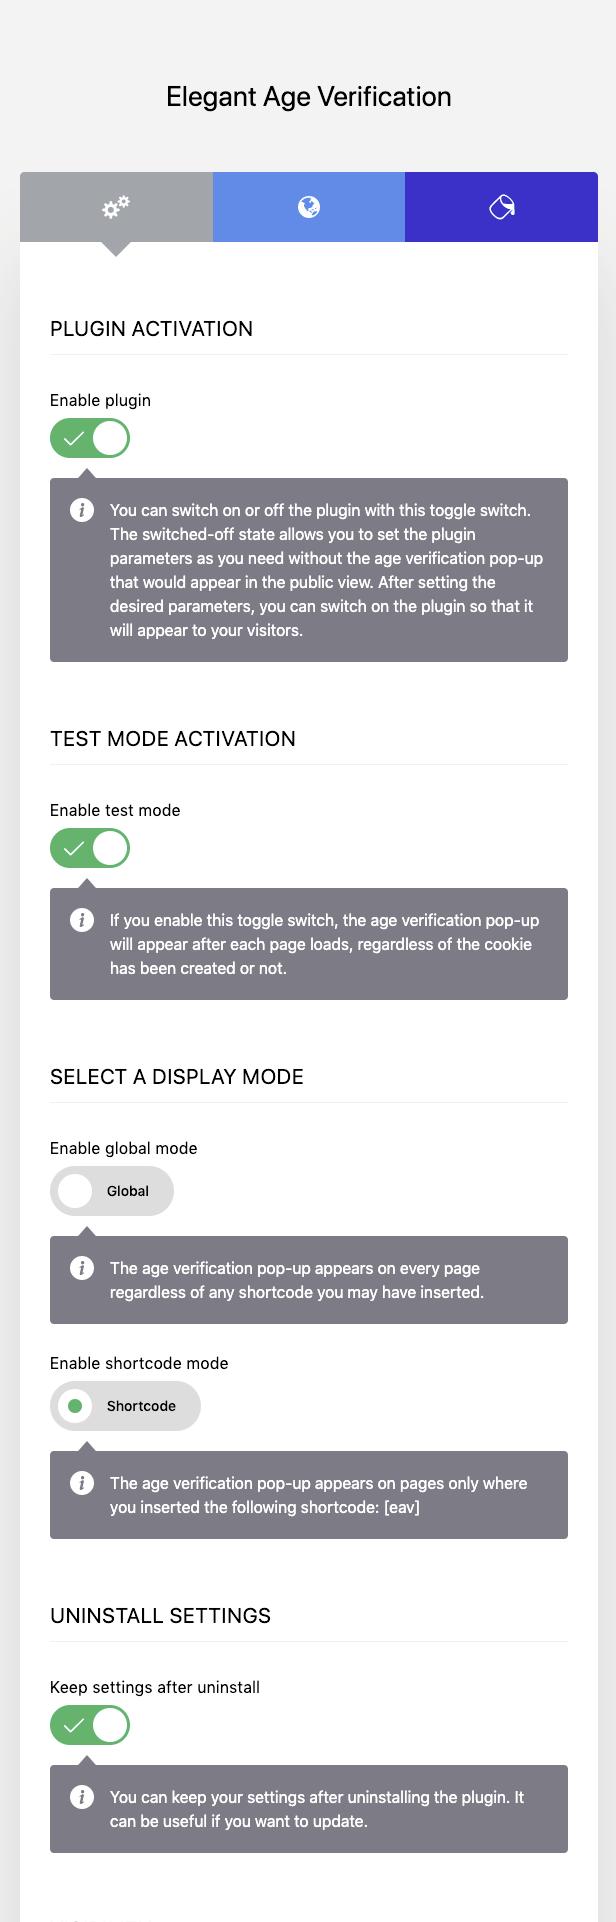 Elegant Age Verification Administration Interface – General Settings – Basic configuration